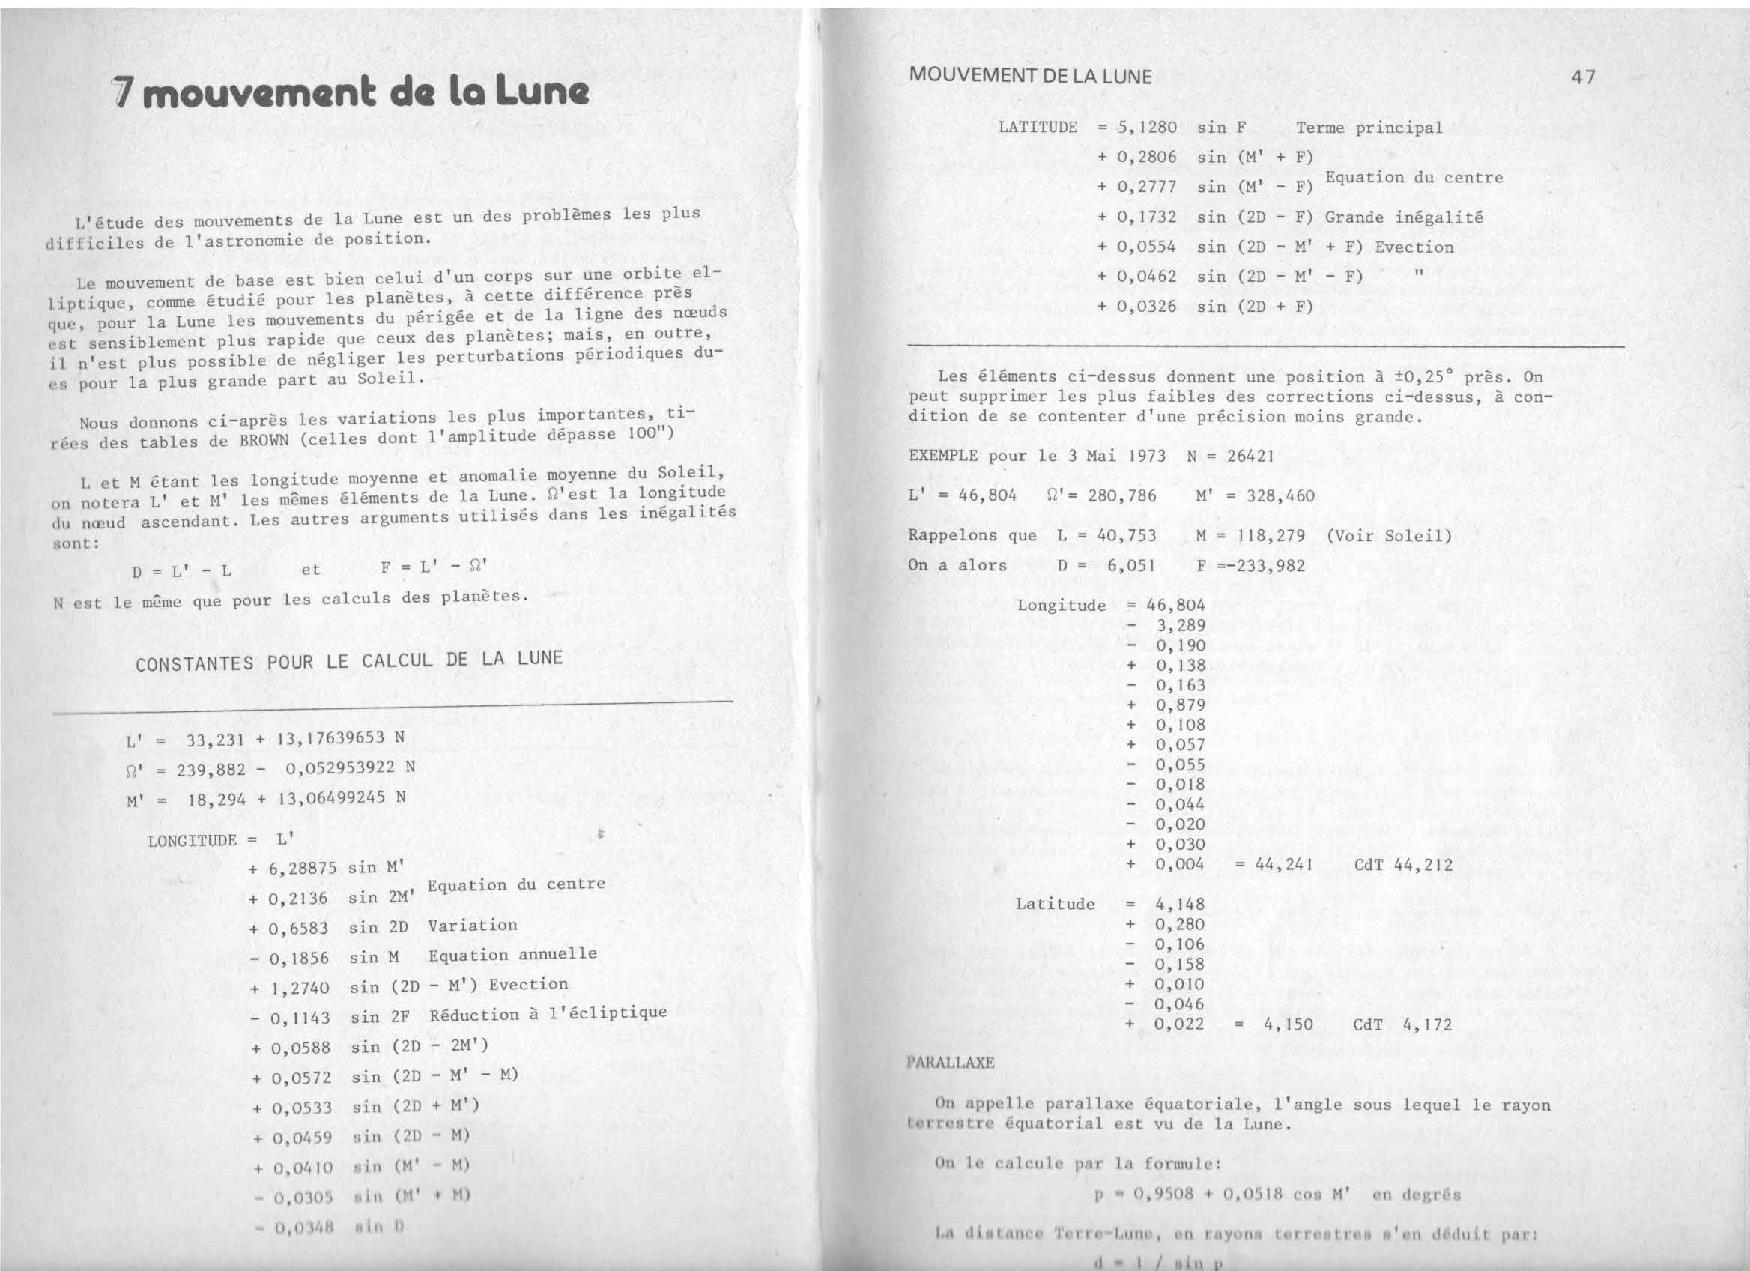 Bouiges1_1980b.jpg